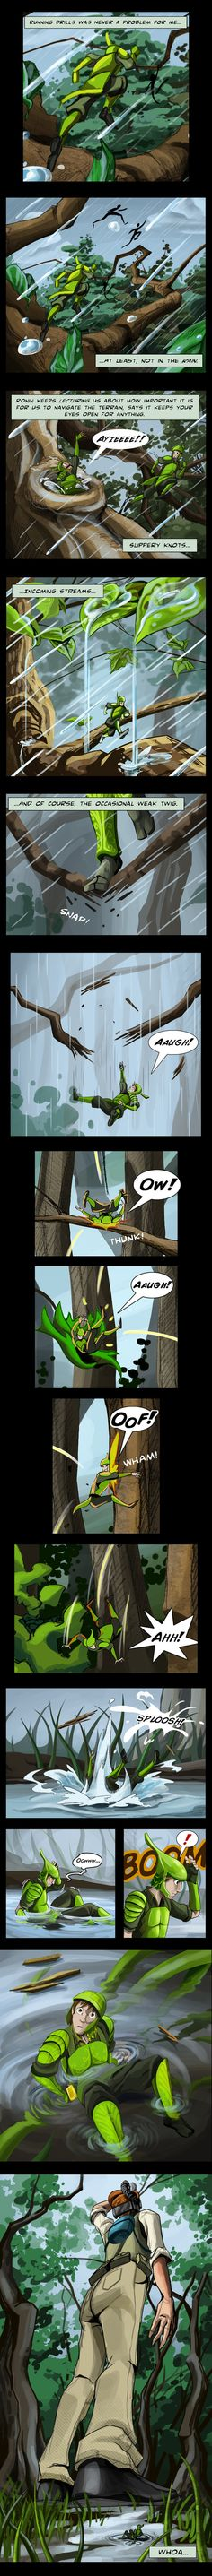 Epic Comic - Nod by ~QartuneQueen on deviantART